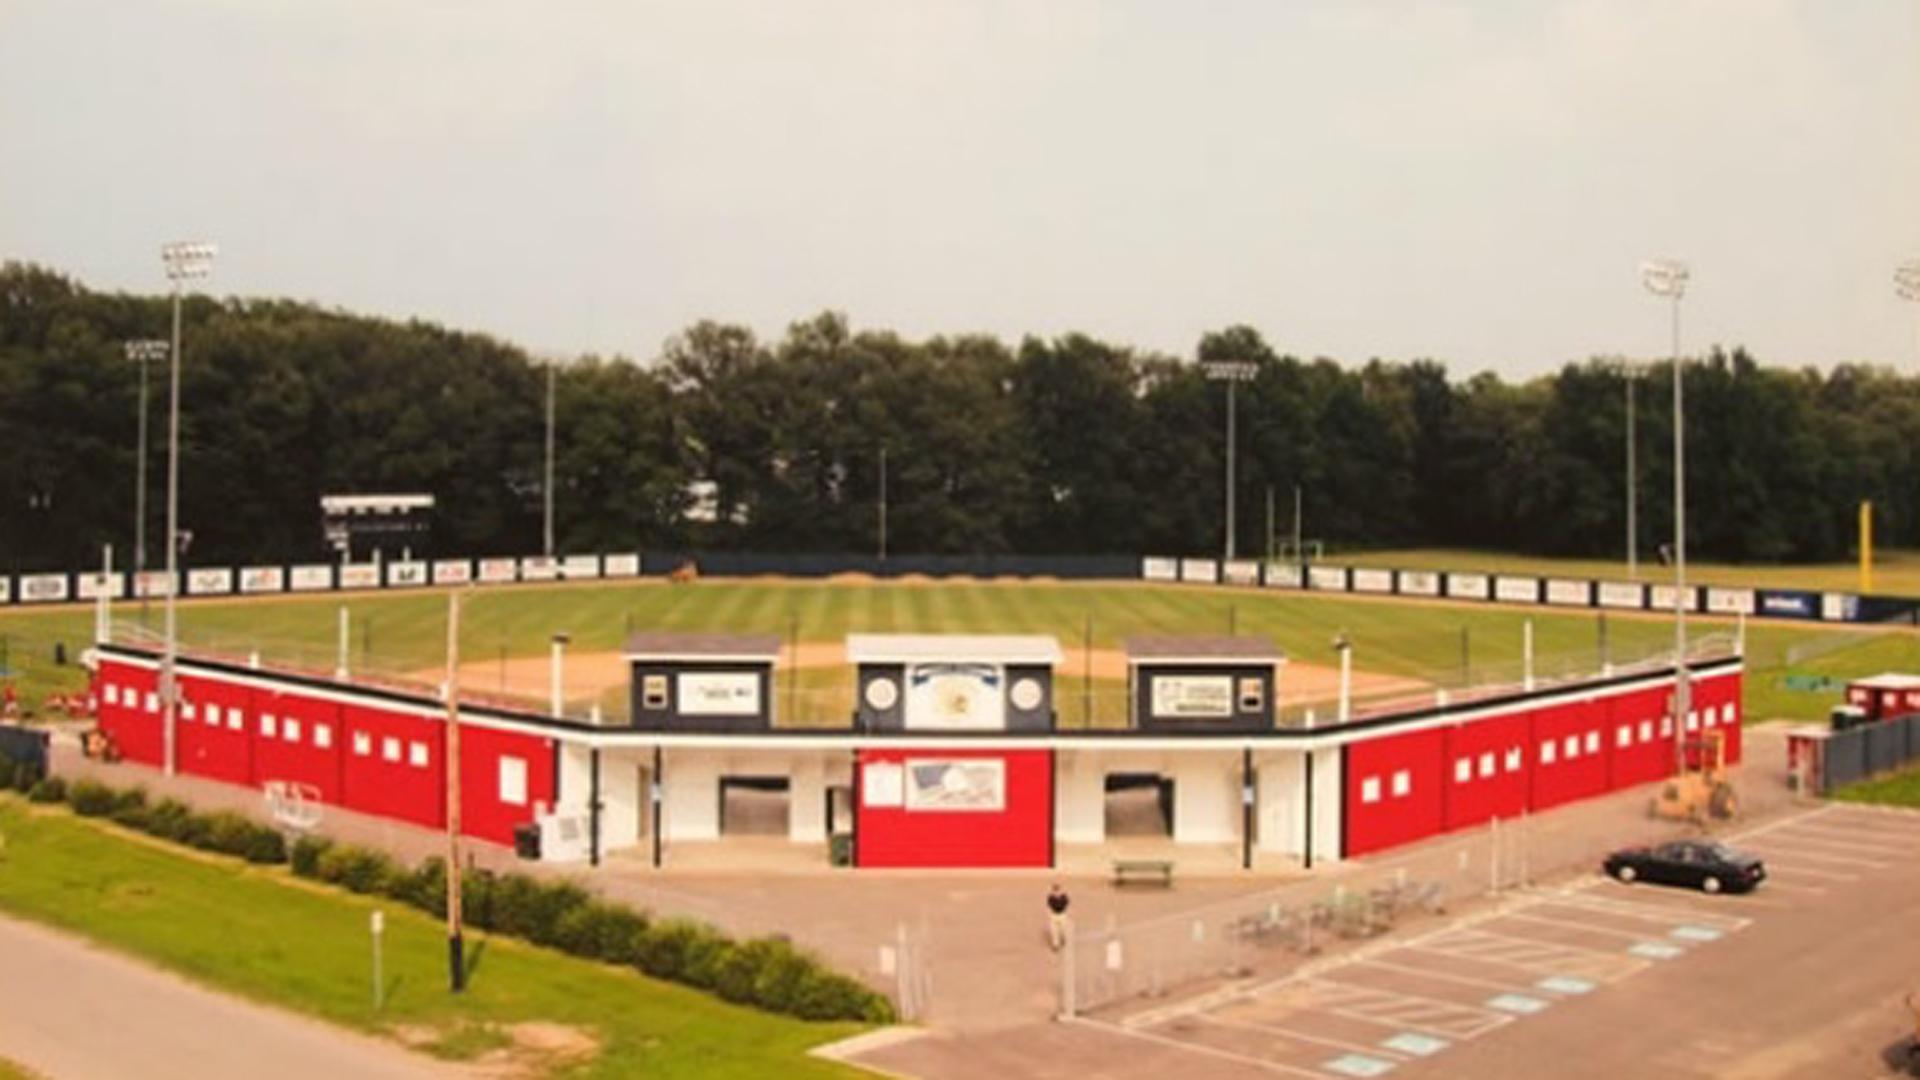 paducah-stadium-032915-brooks-ftr